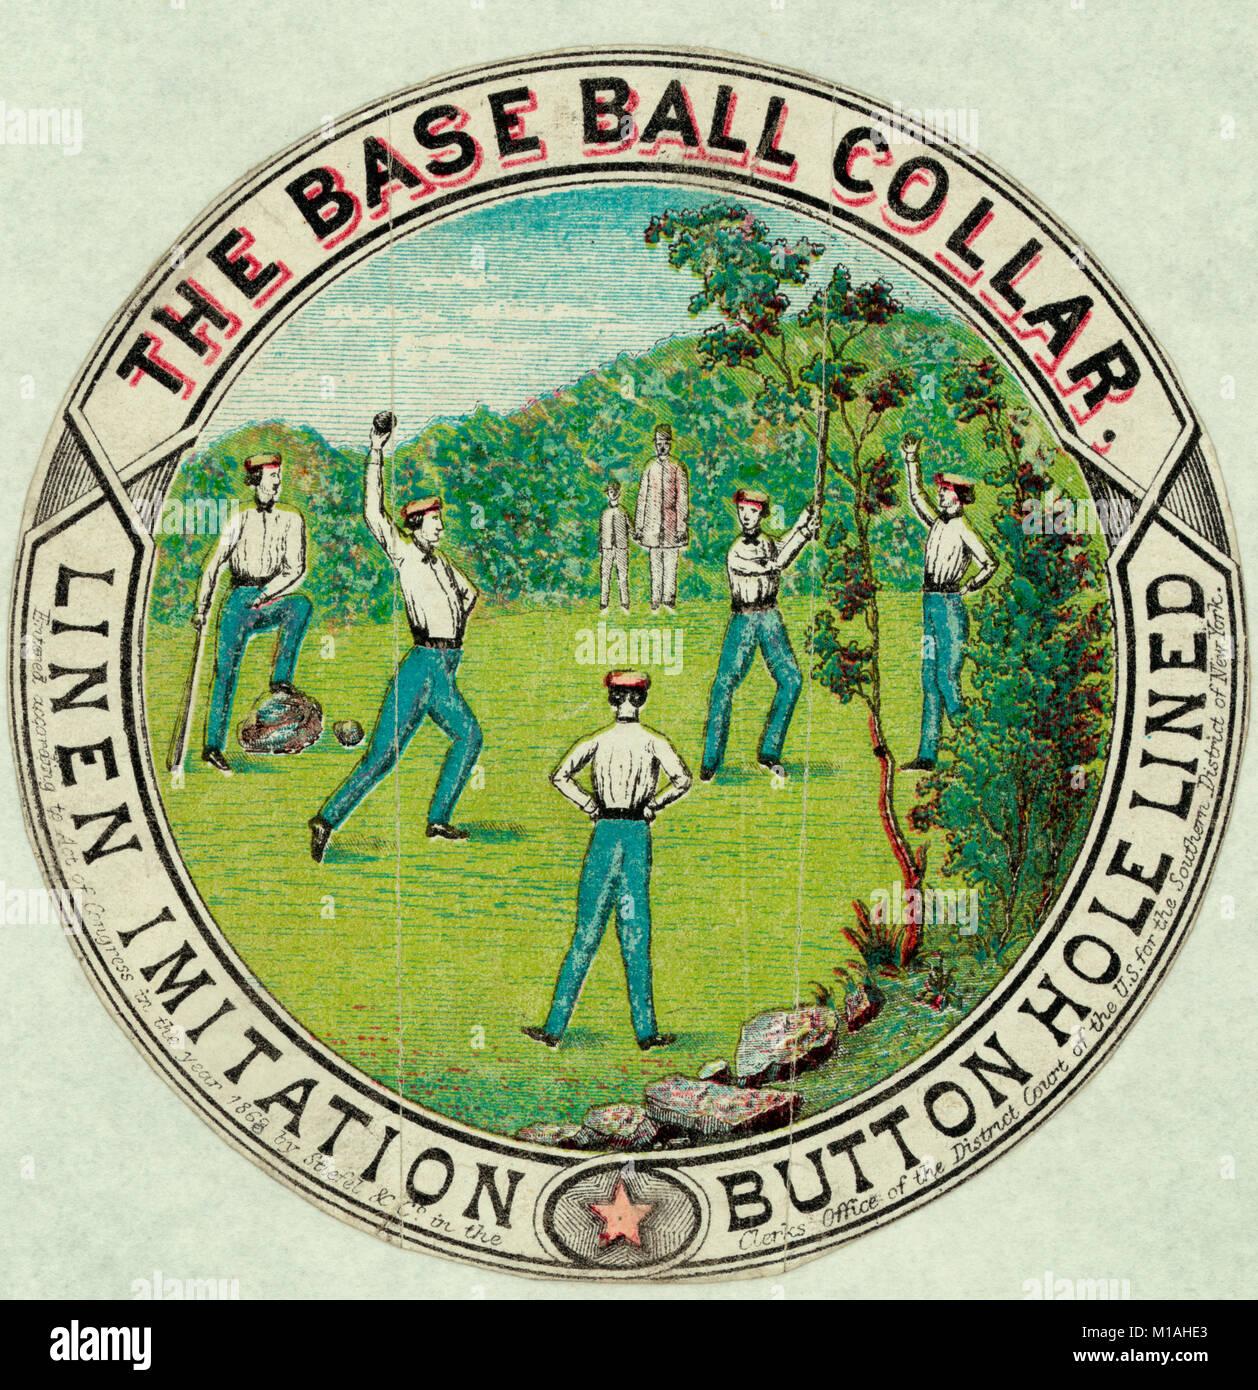 The base ball collar - Men wearing uniforms with collars during baseball game. Advertisement, circa 1869 - Stock Image